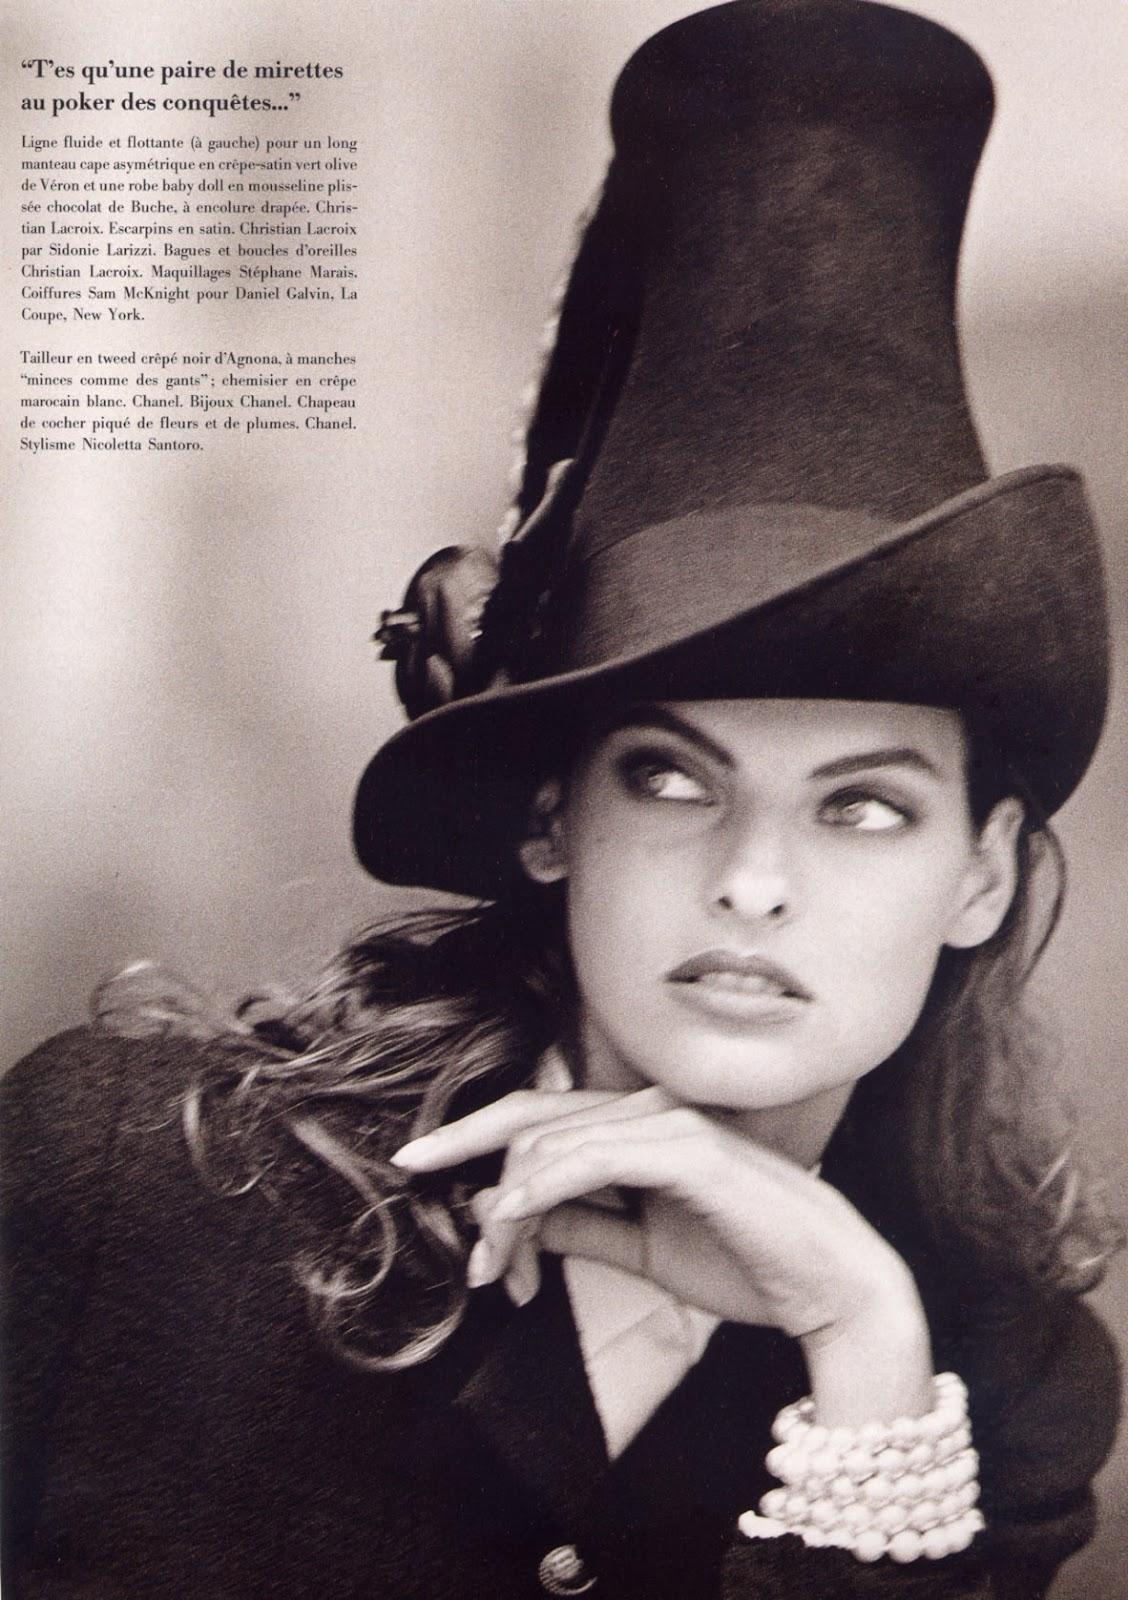 http://2.bp.blogspot.com/-tdNImPQCCss/T1jwvG5OQ3I/AAAAAAAAEAo/yTbJ7hA_ORw/s1600/Linda+Evangelista+1988+09+Vogue+Paris+Ph+Unk+04.jpg